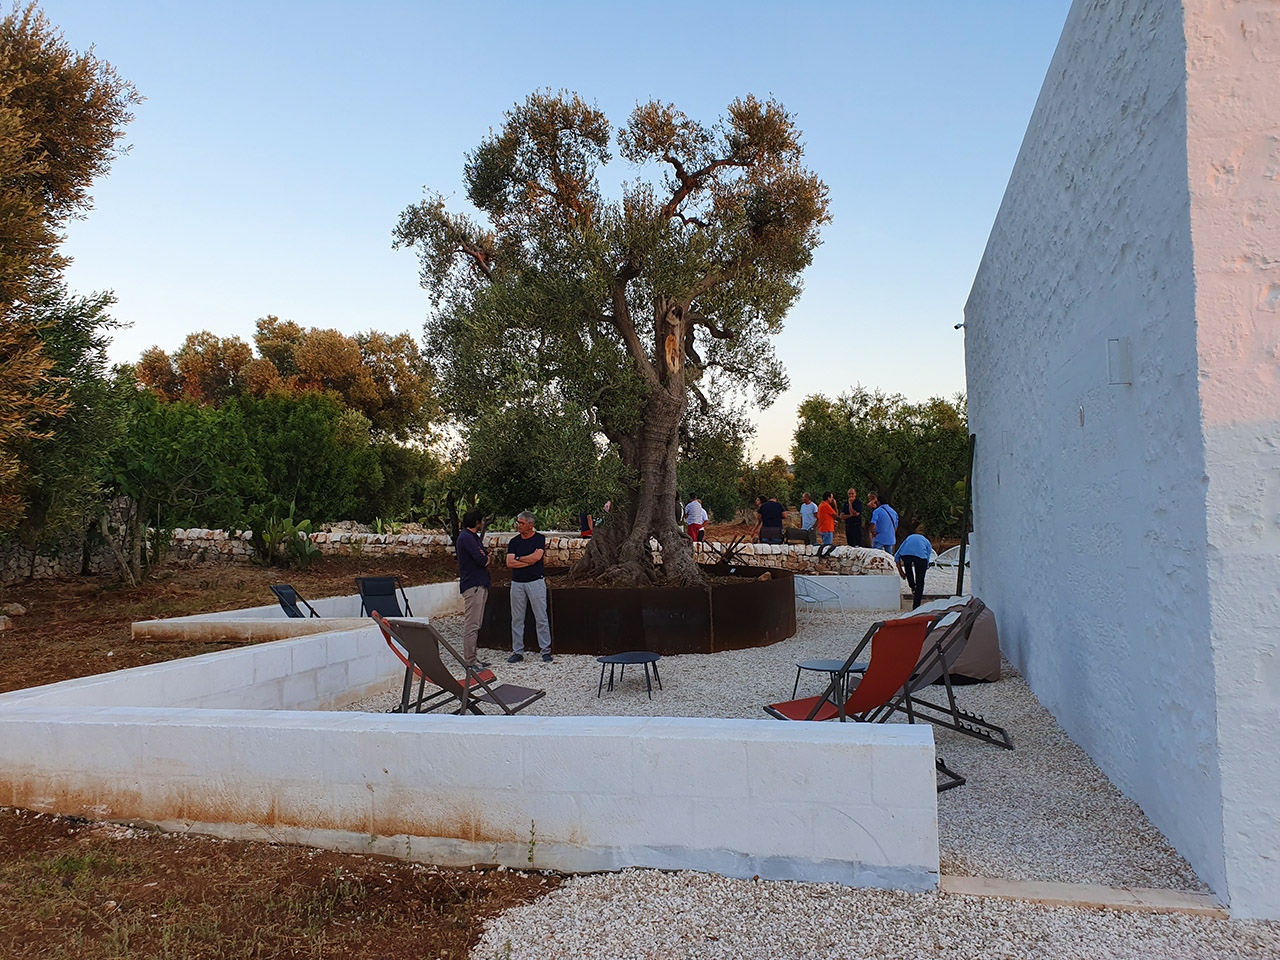 costruzioni restauri sirio ostuni restauro ristrutturazione masseria dagilupi ostuni 20190628 201337